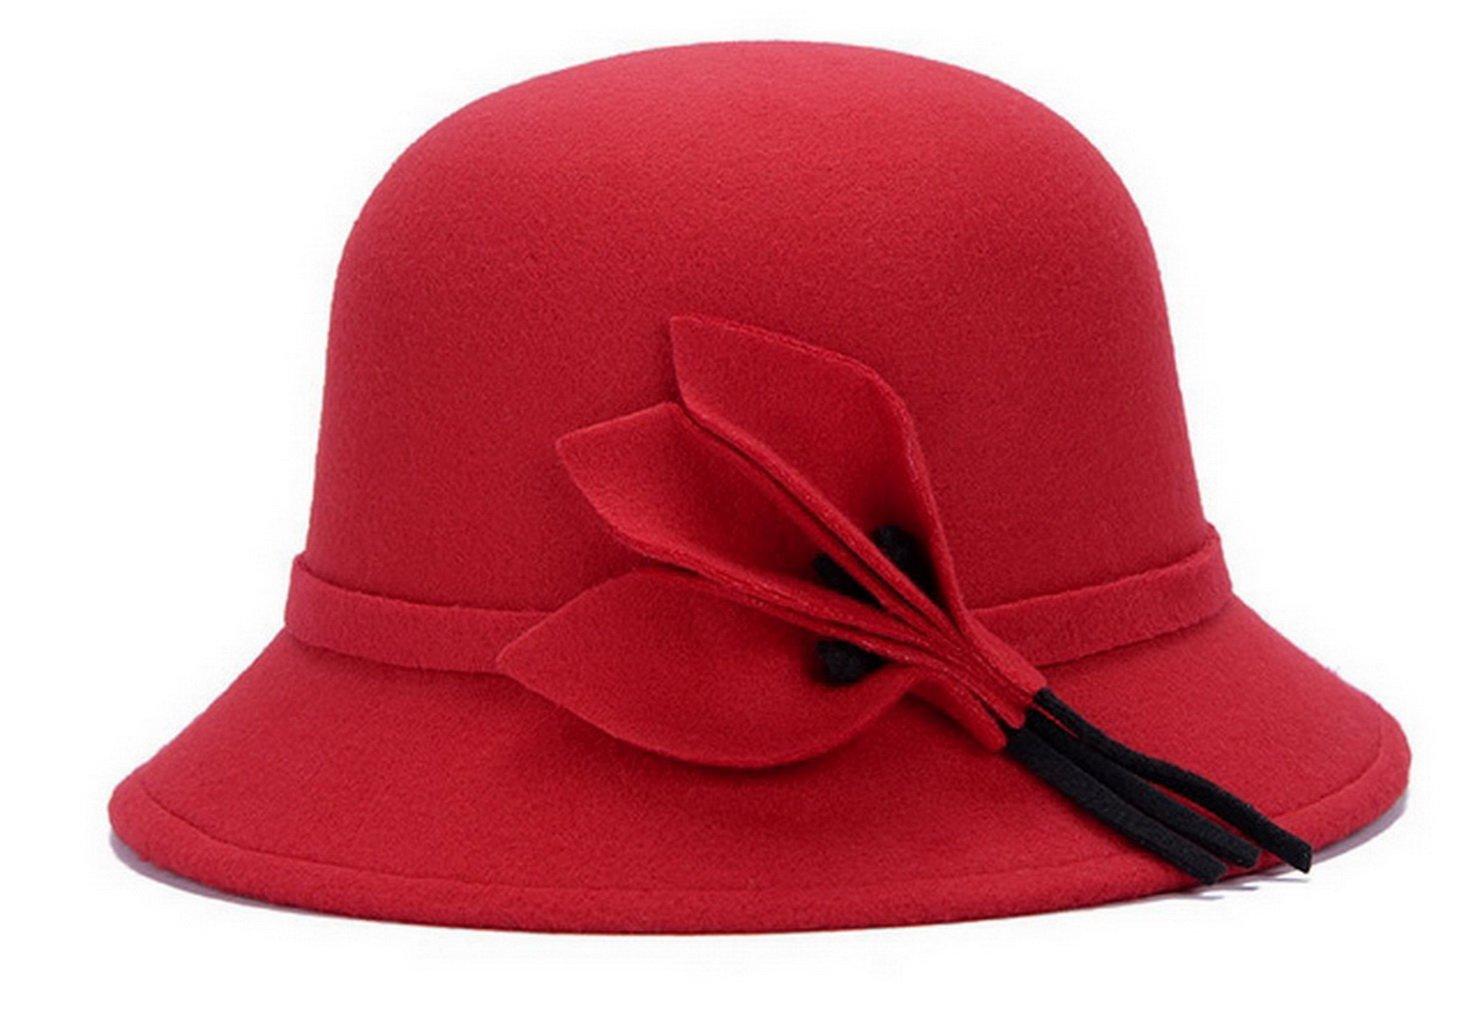 Brcus Women Wool Felt Church Cloche Cap Bucket Hat Bowler Hats with Leaves Band